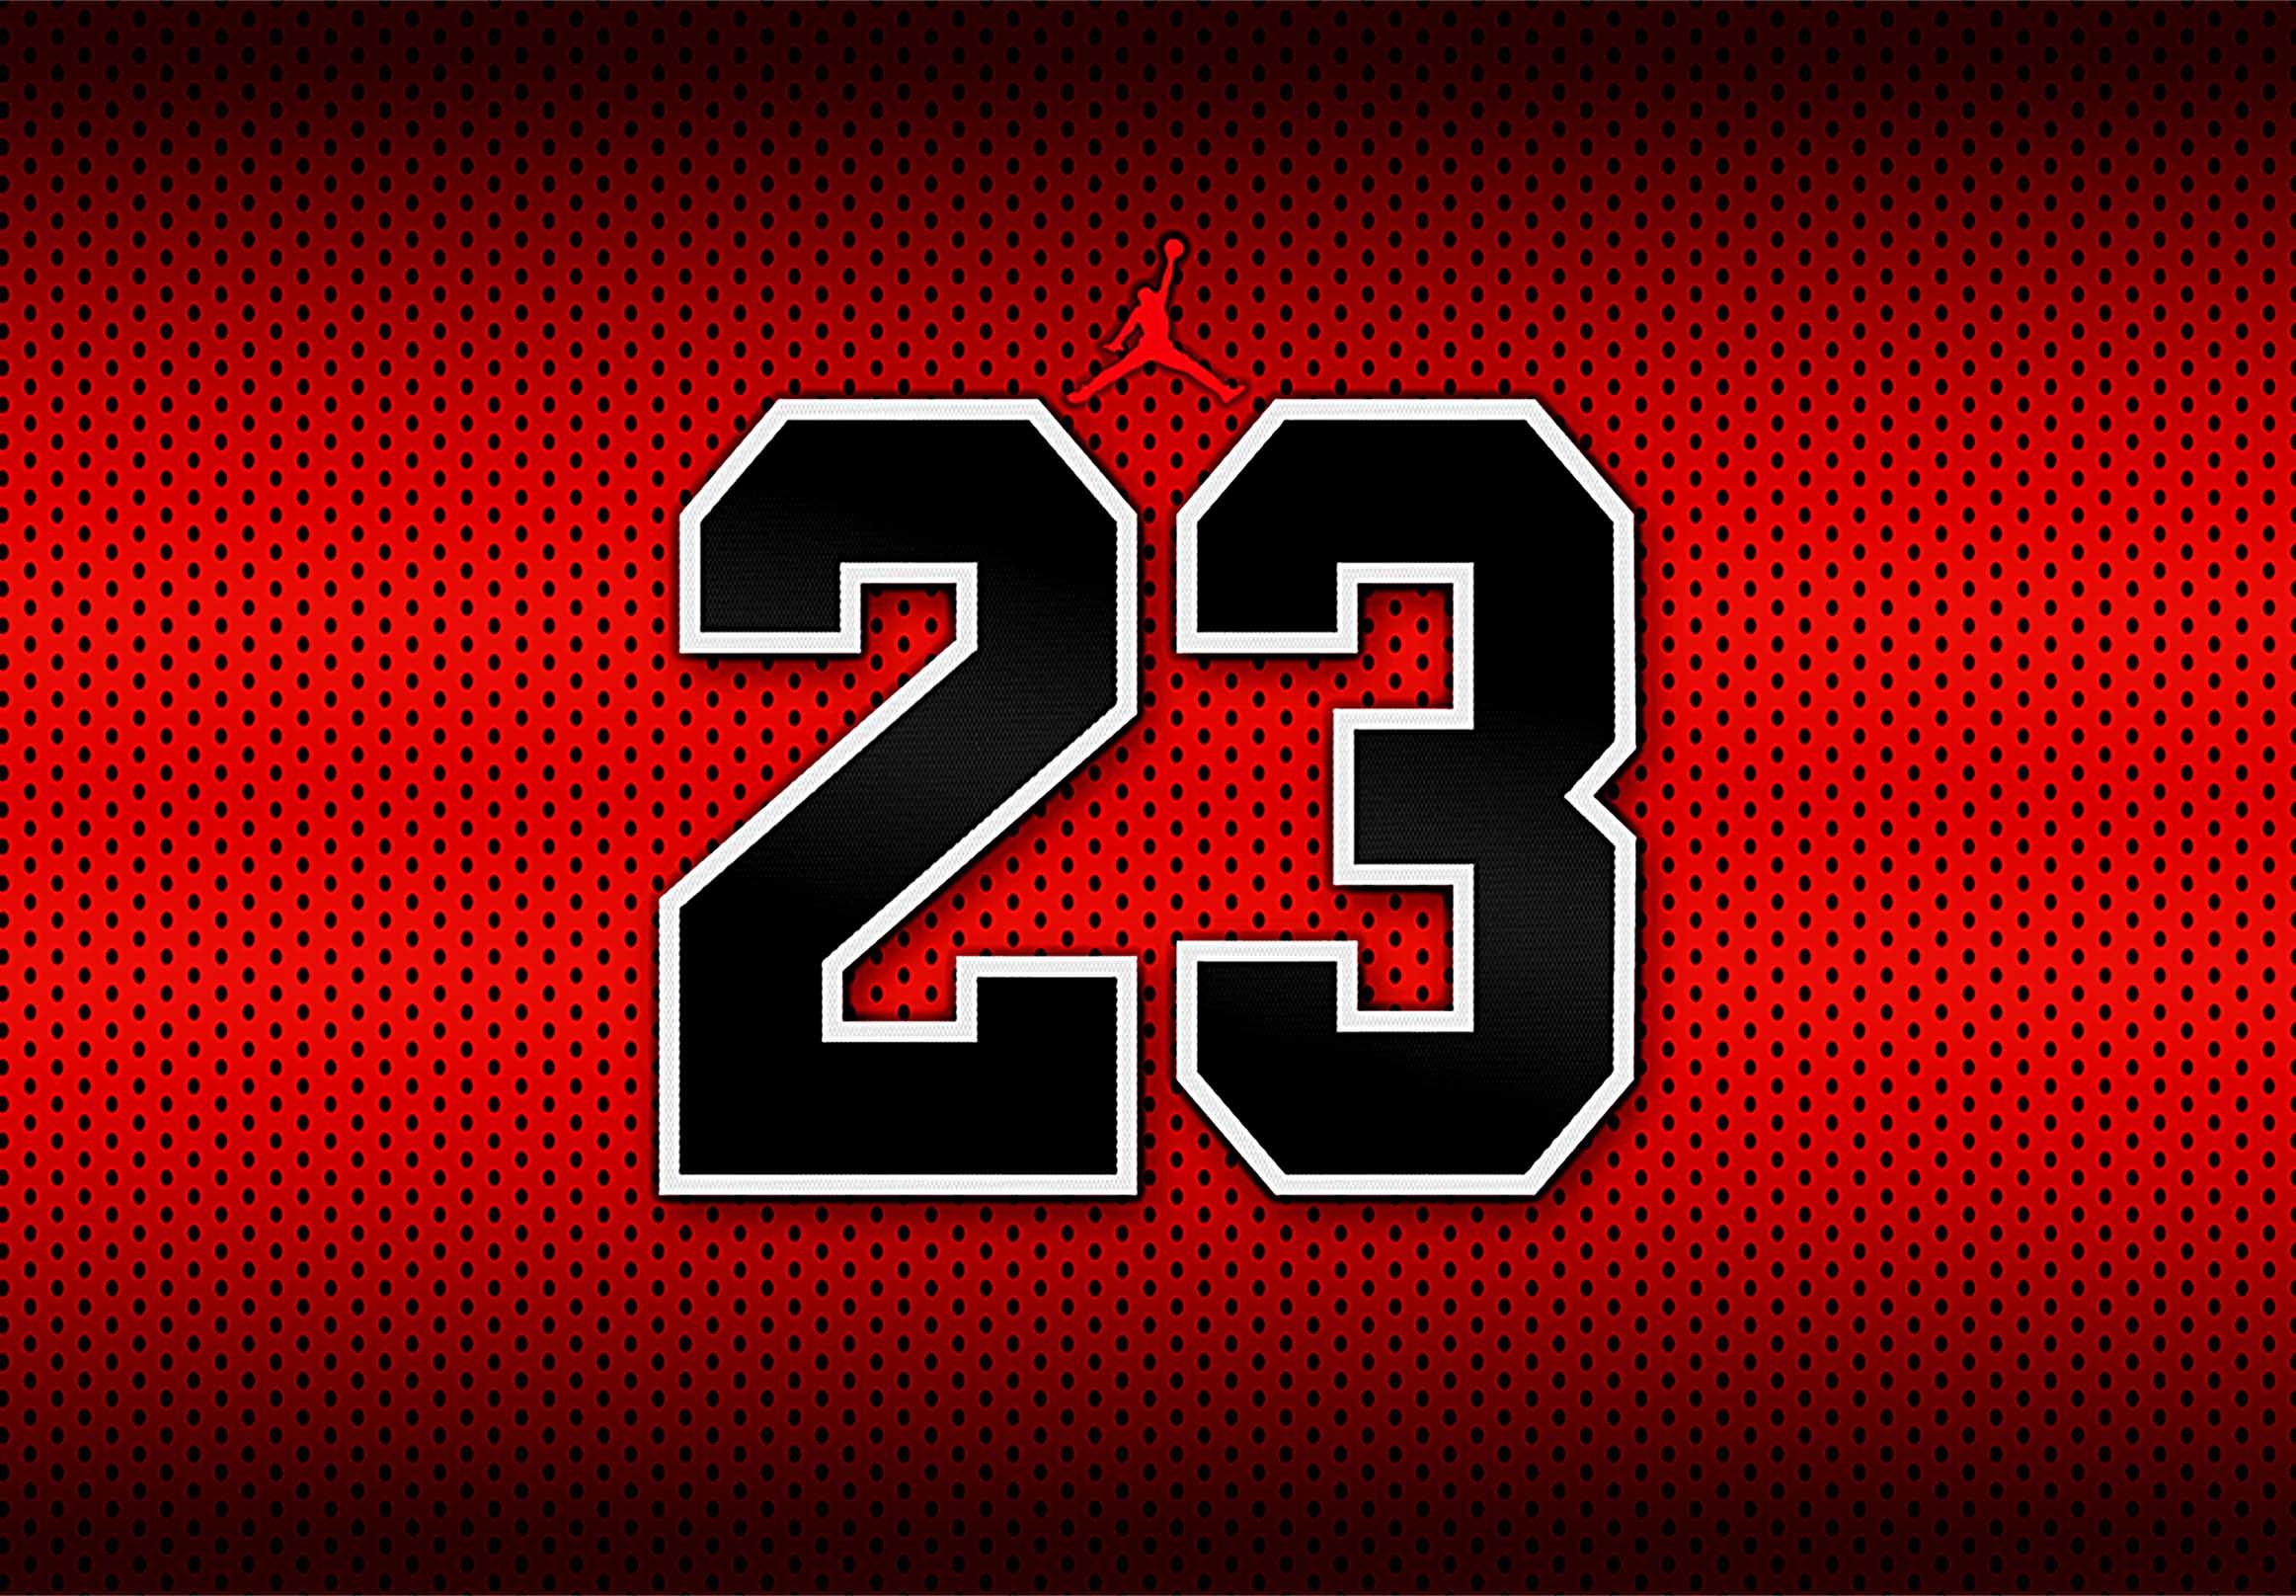 Chicago Bulls Jordan 23 Canvas Tablo (Nba-canvas-jordan23)